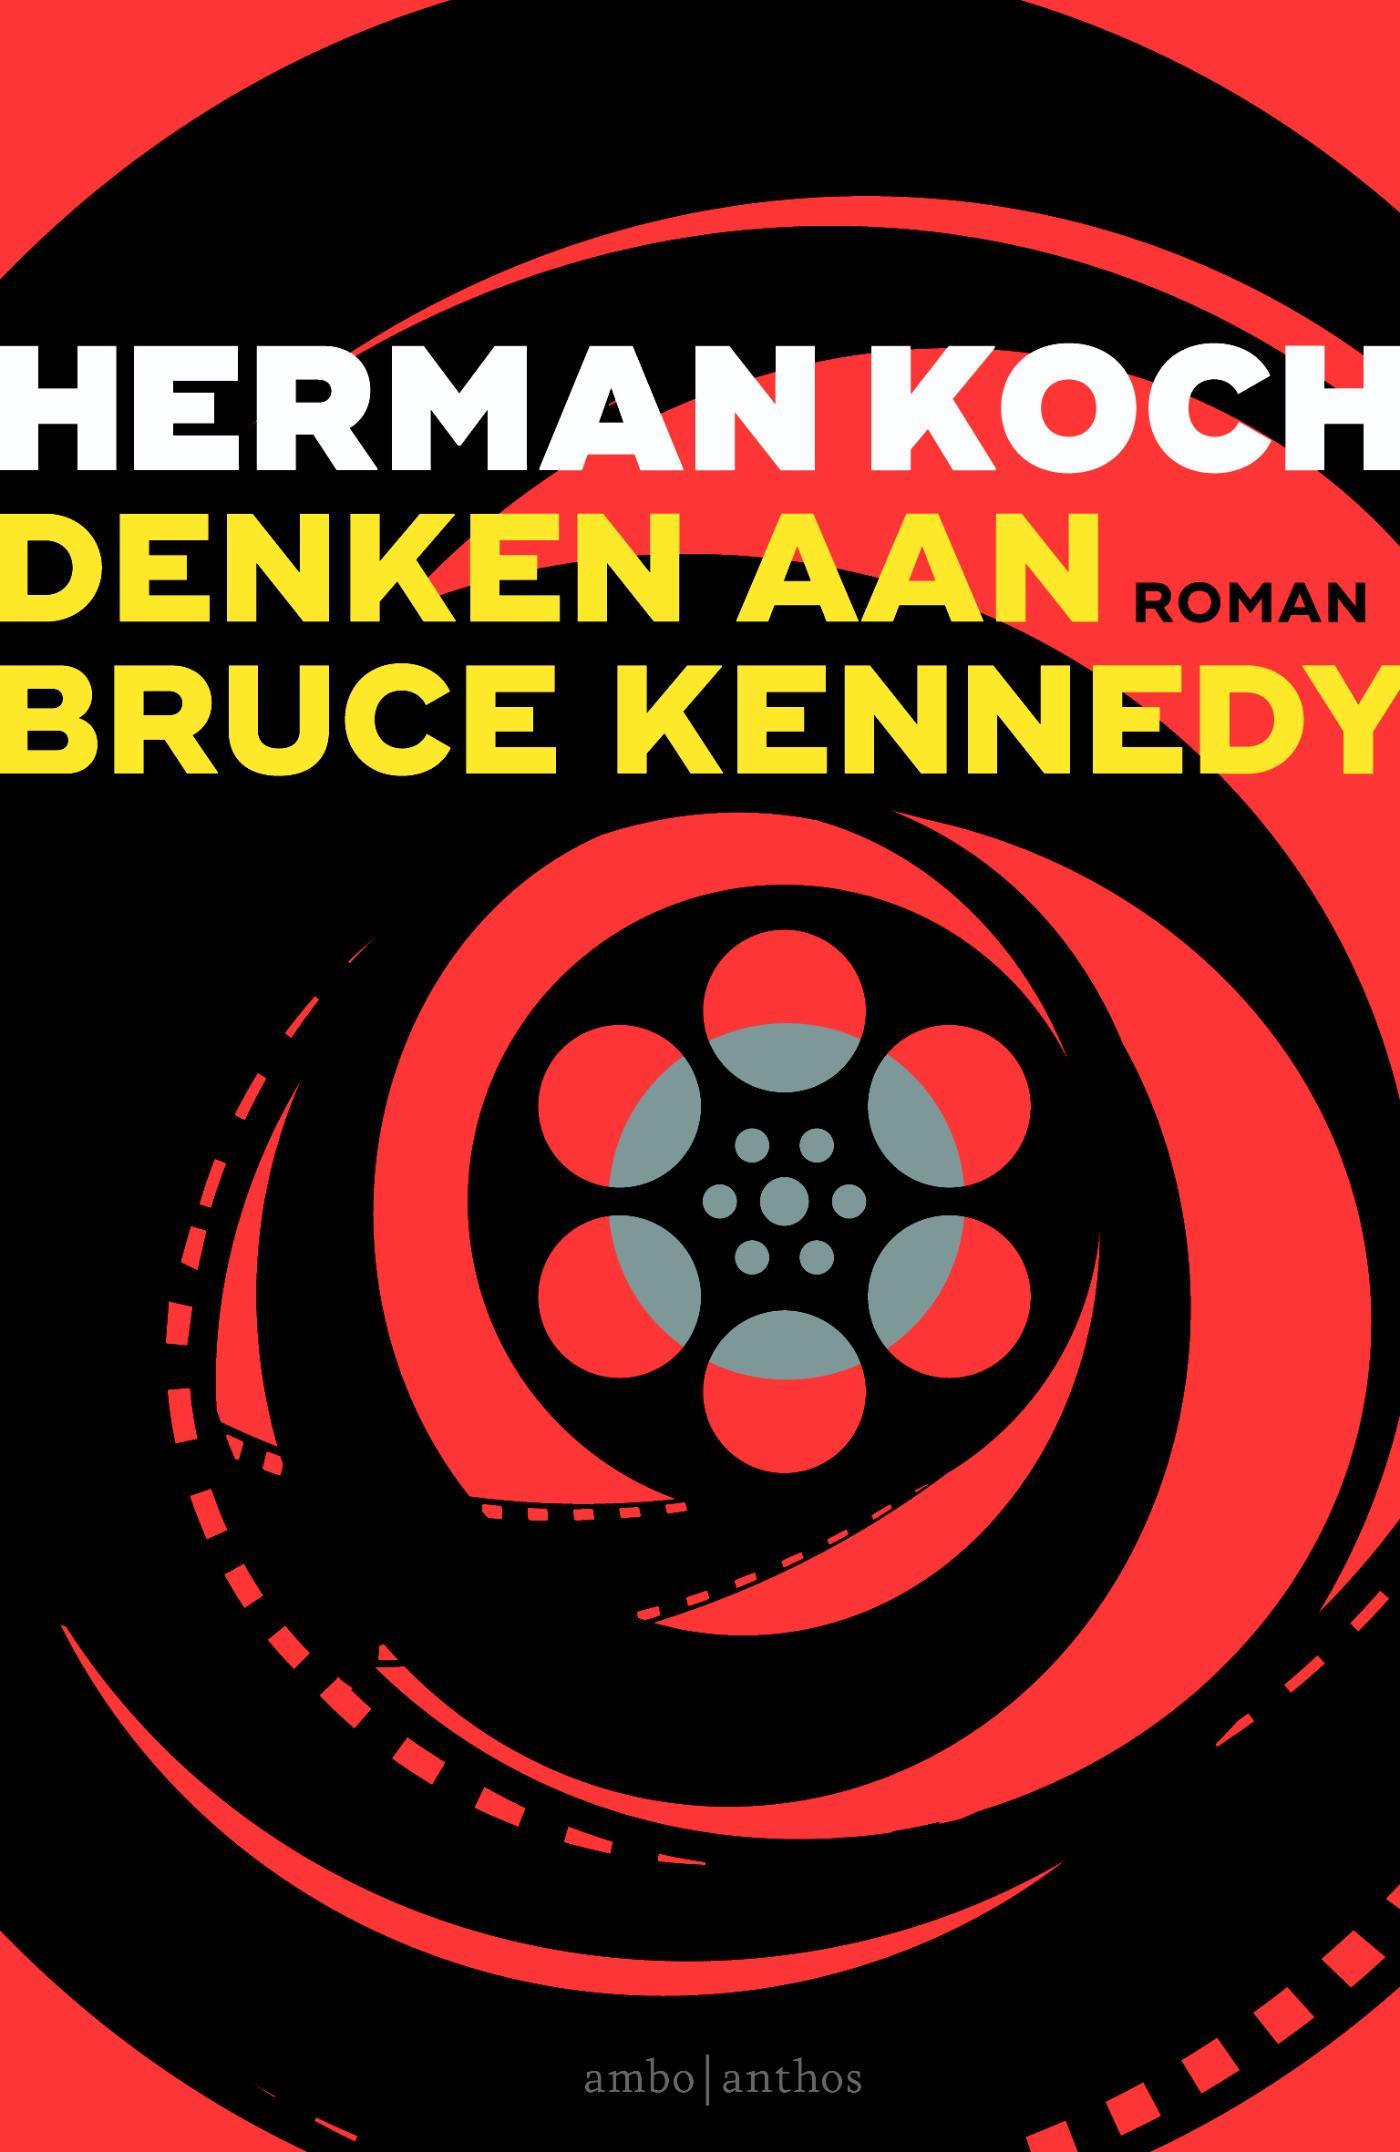 Denken aan Bruce Kennedy